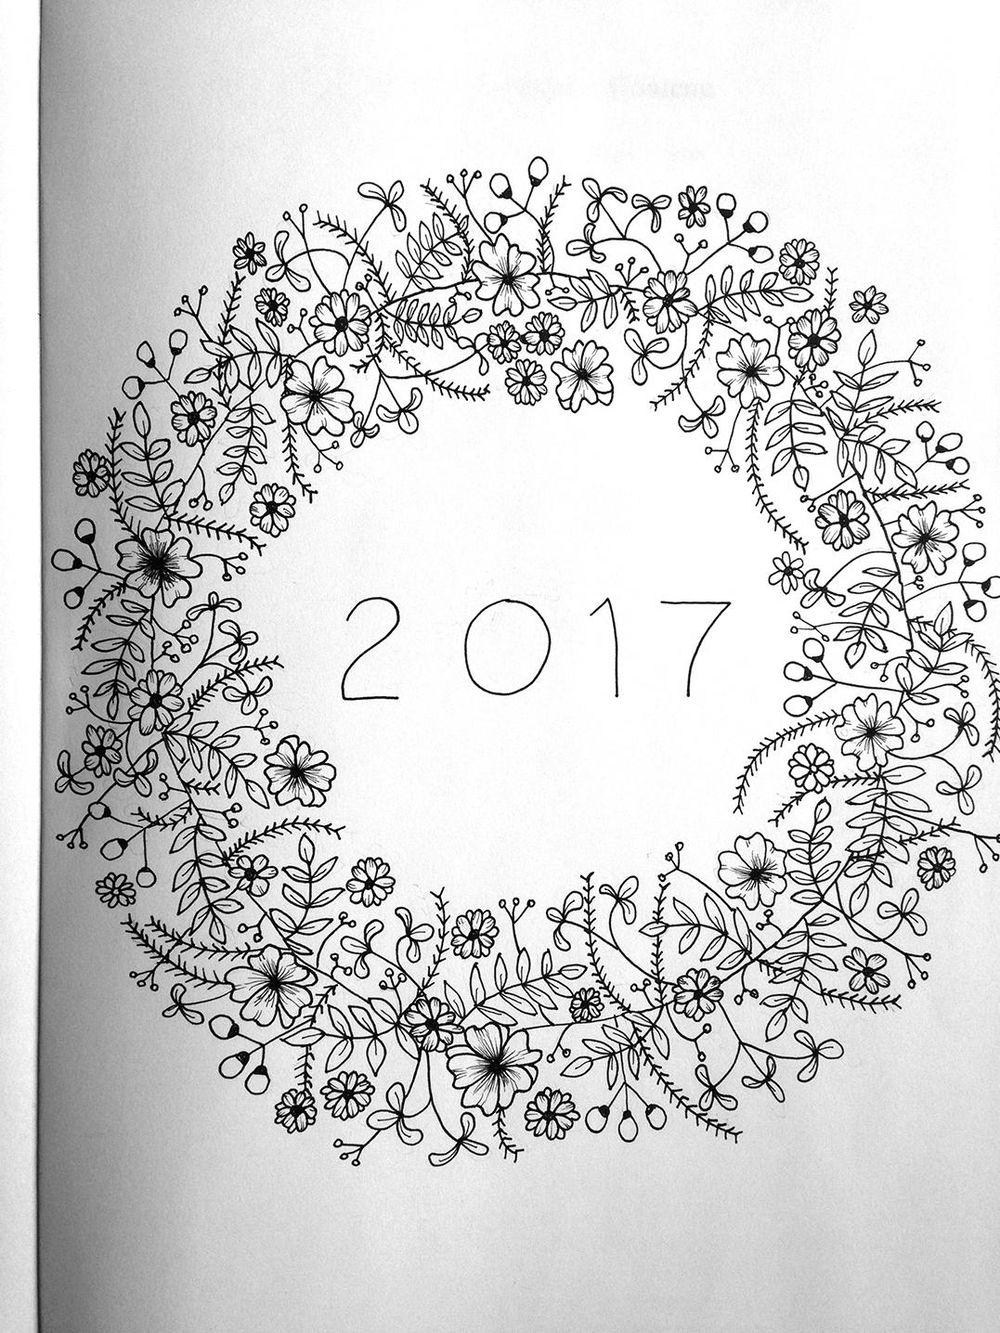 Bullet Journal Botanicals - image 2 - student project